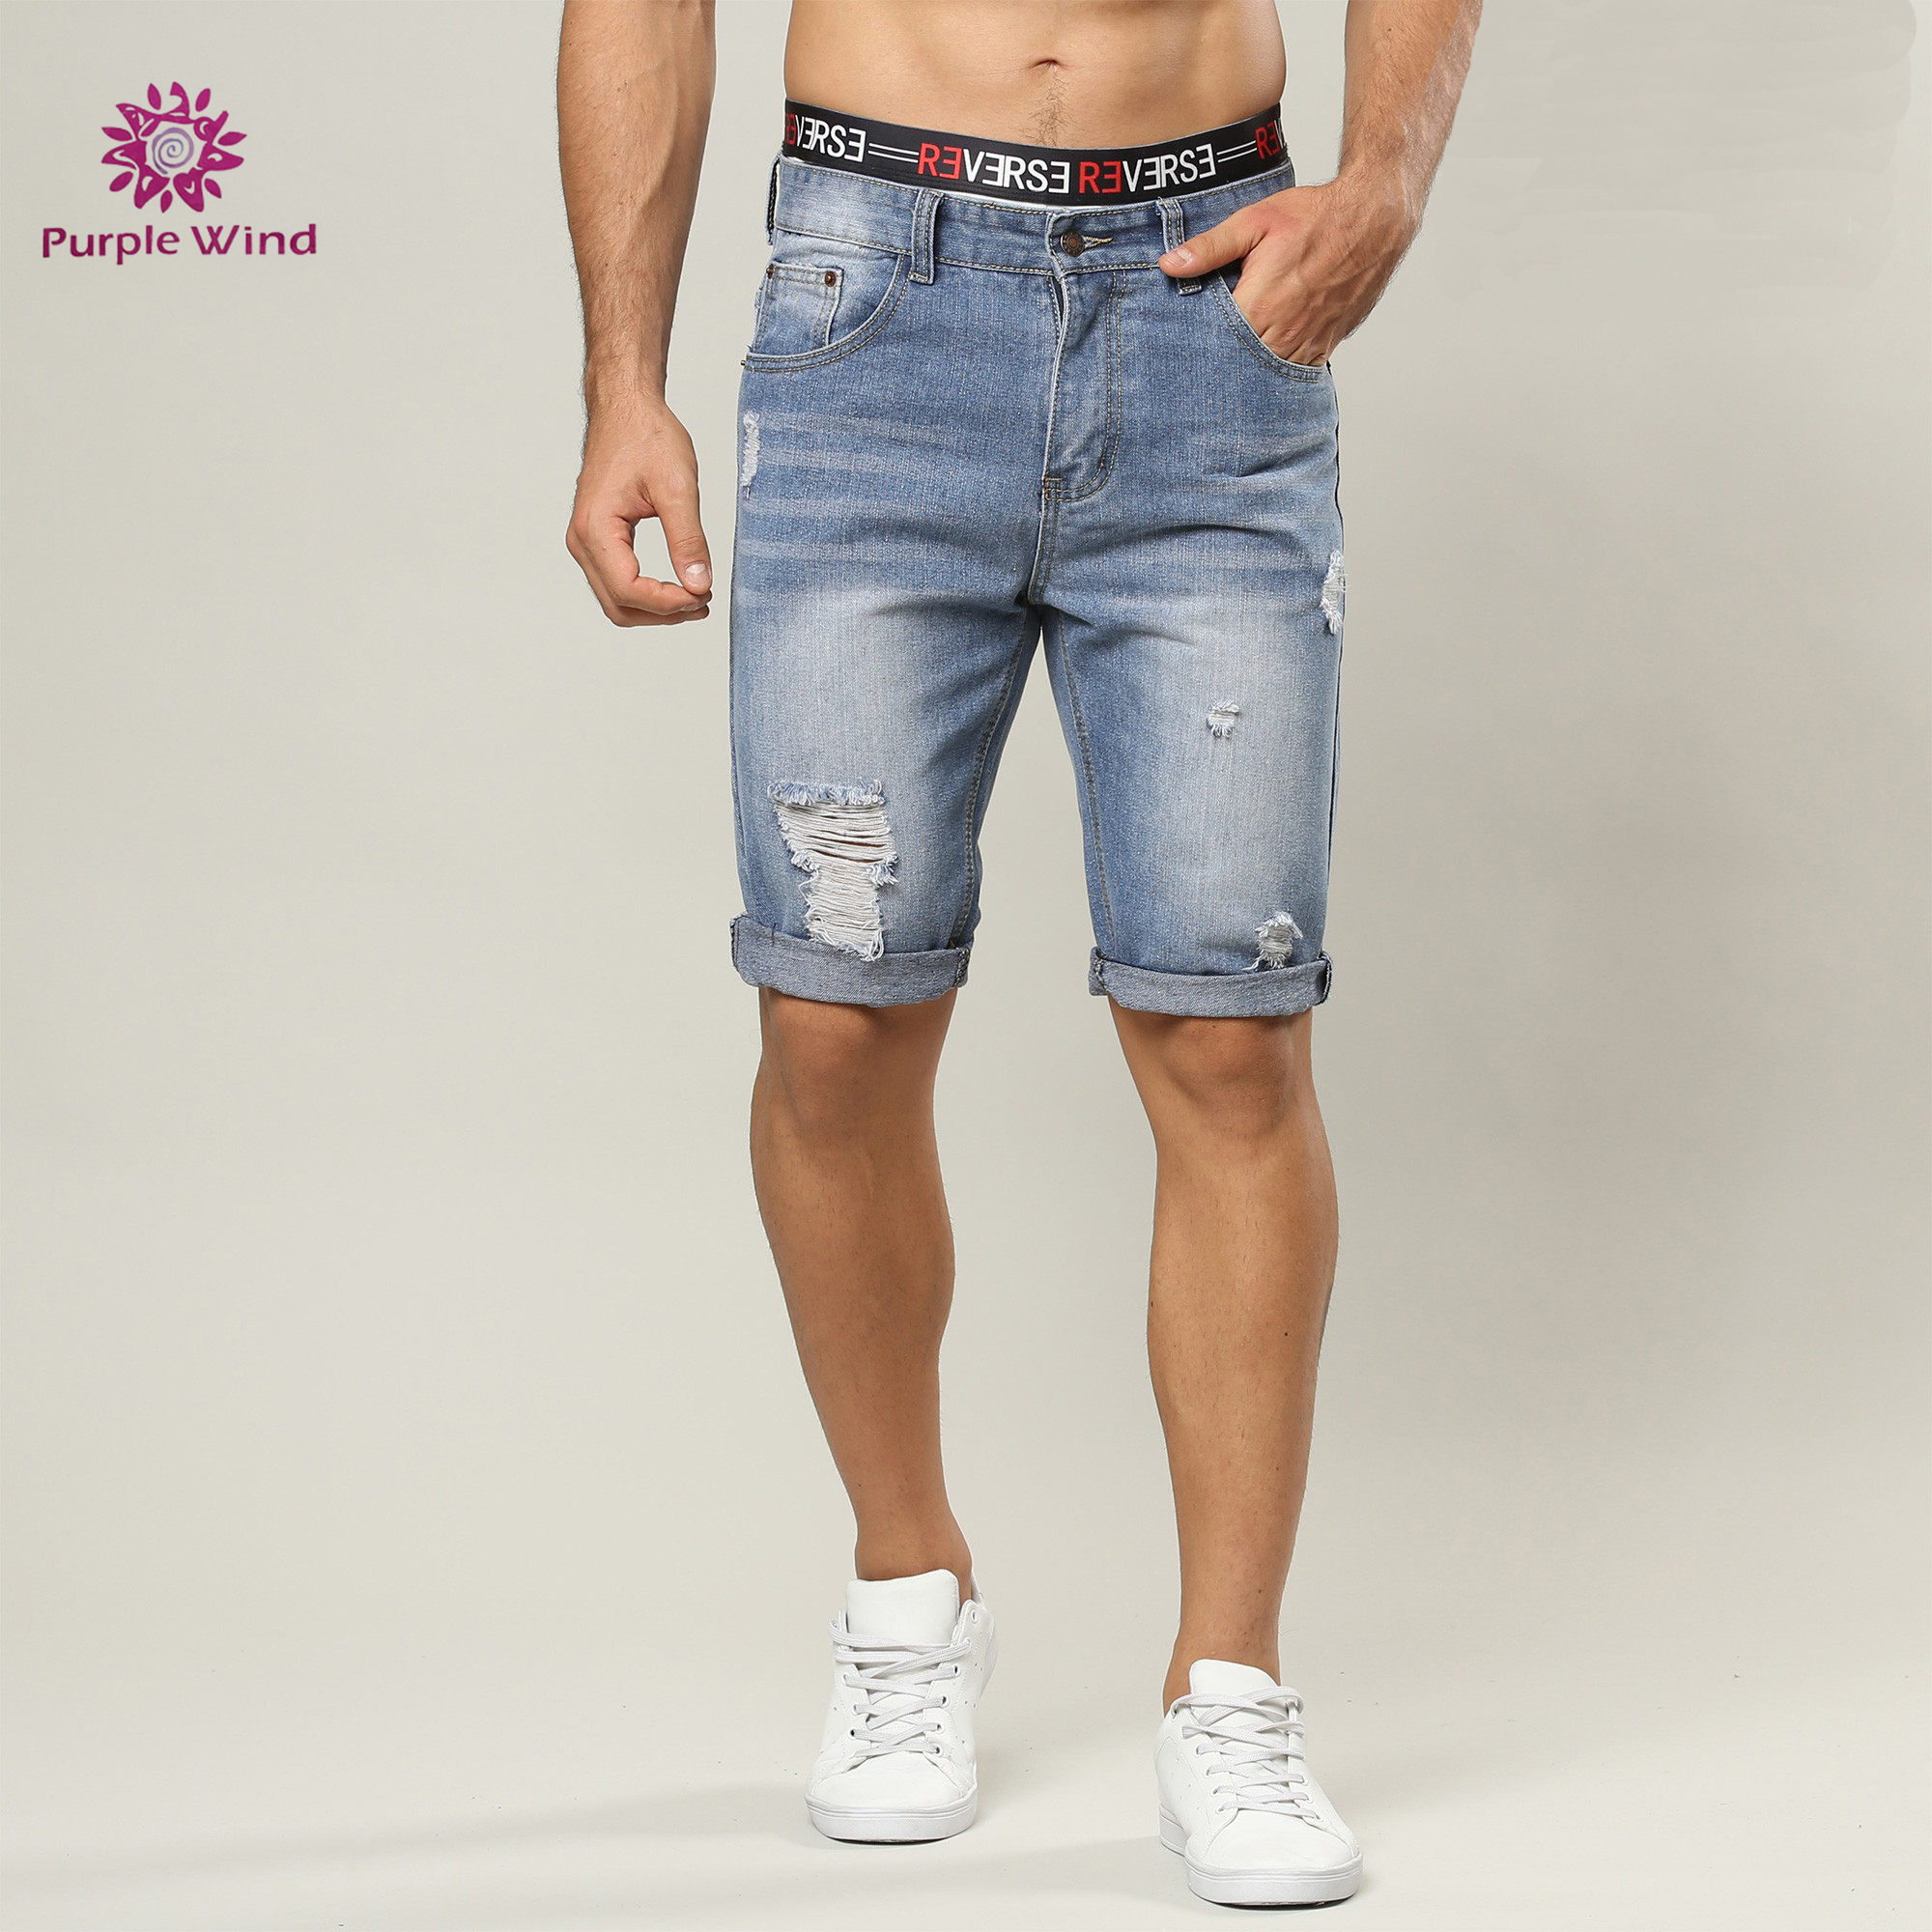 11d1f3ac0fad Distressed Casual Style Light Blue Summer Denim Men s Short Jeans ...